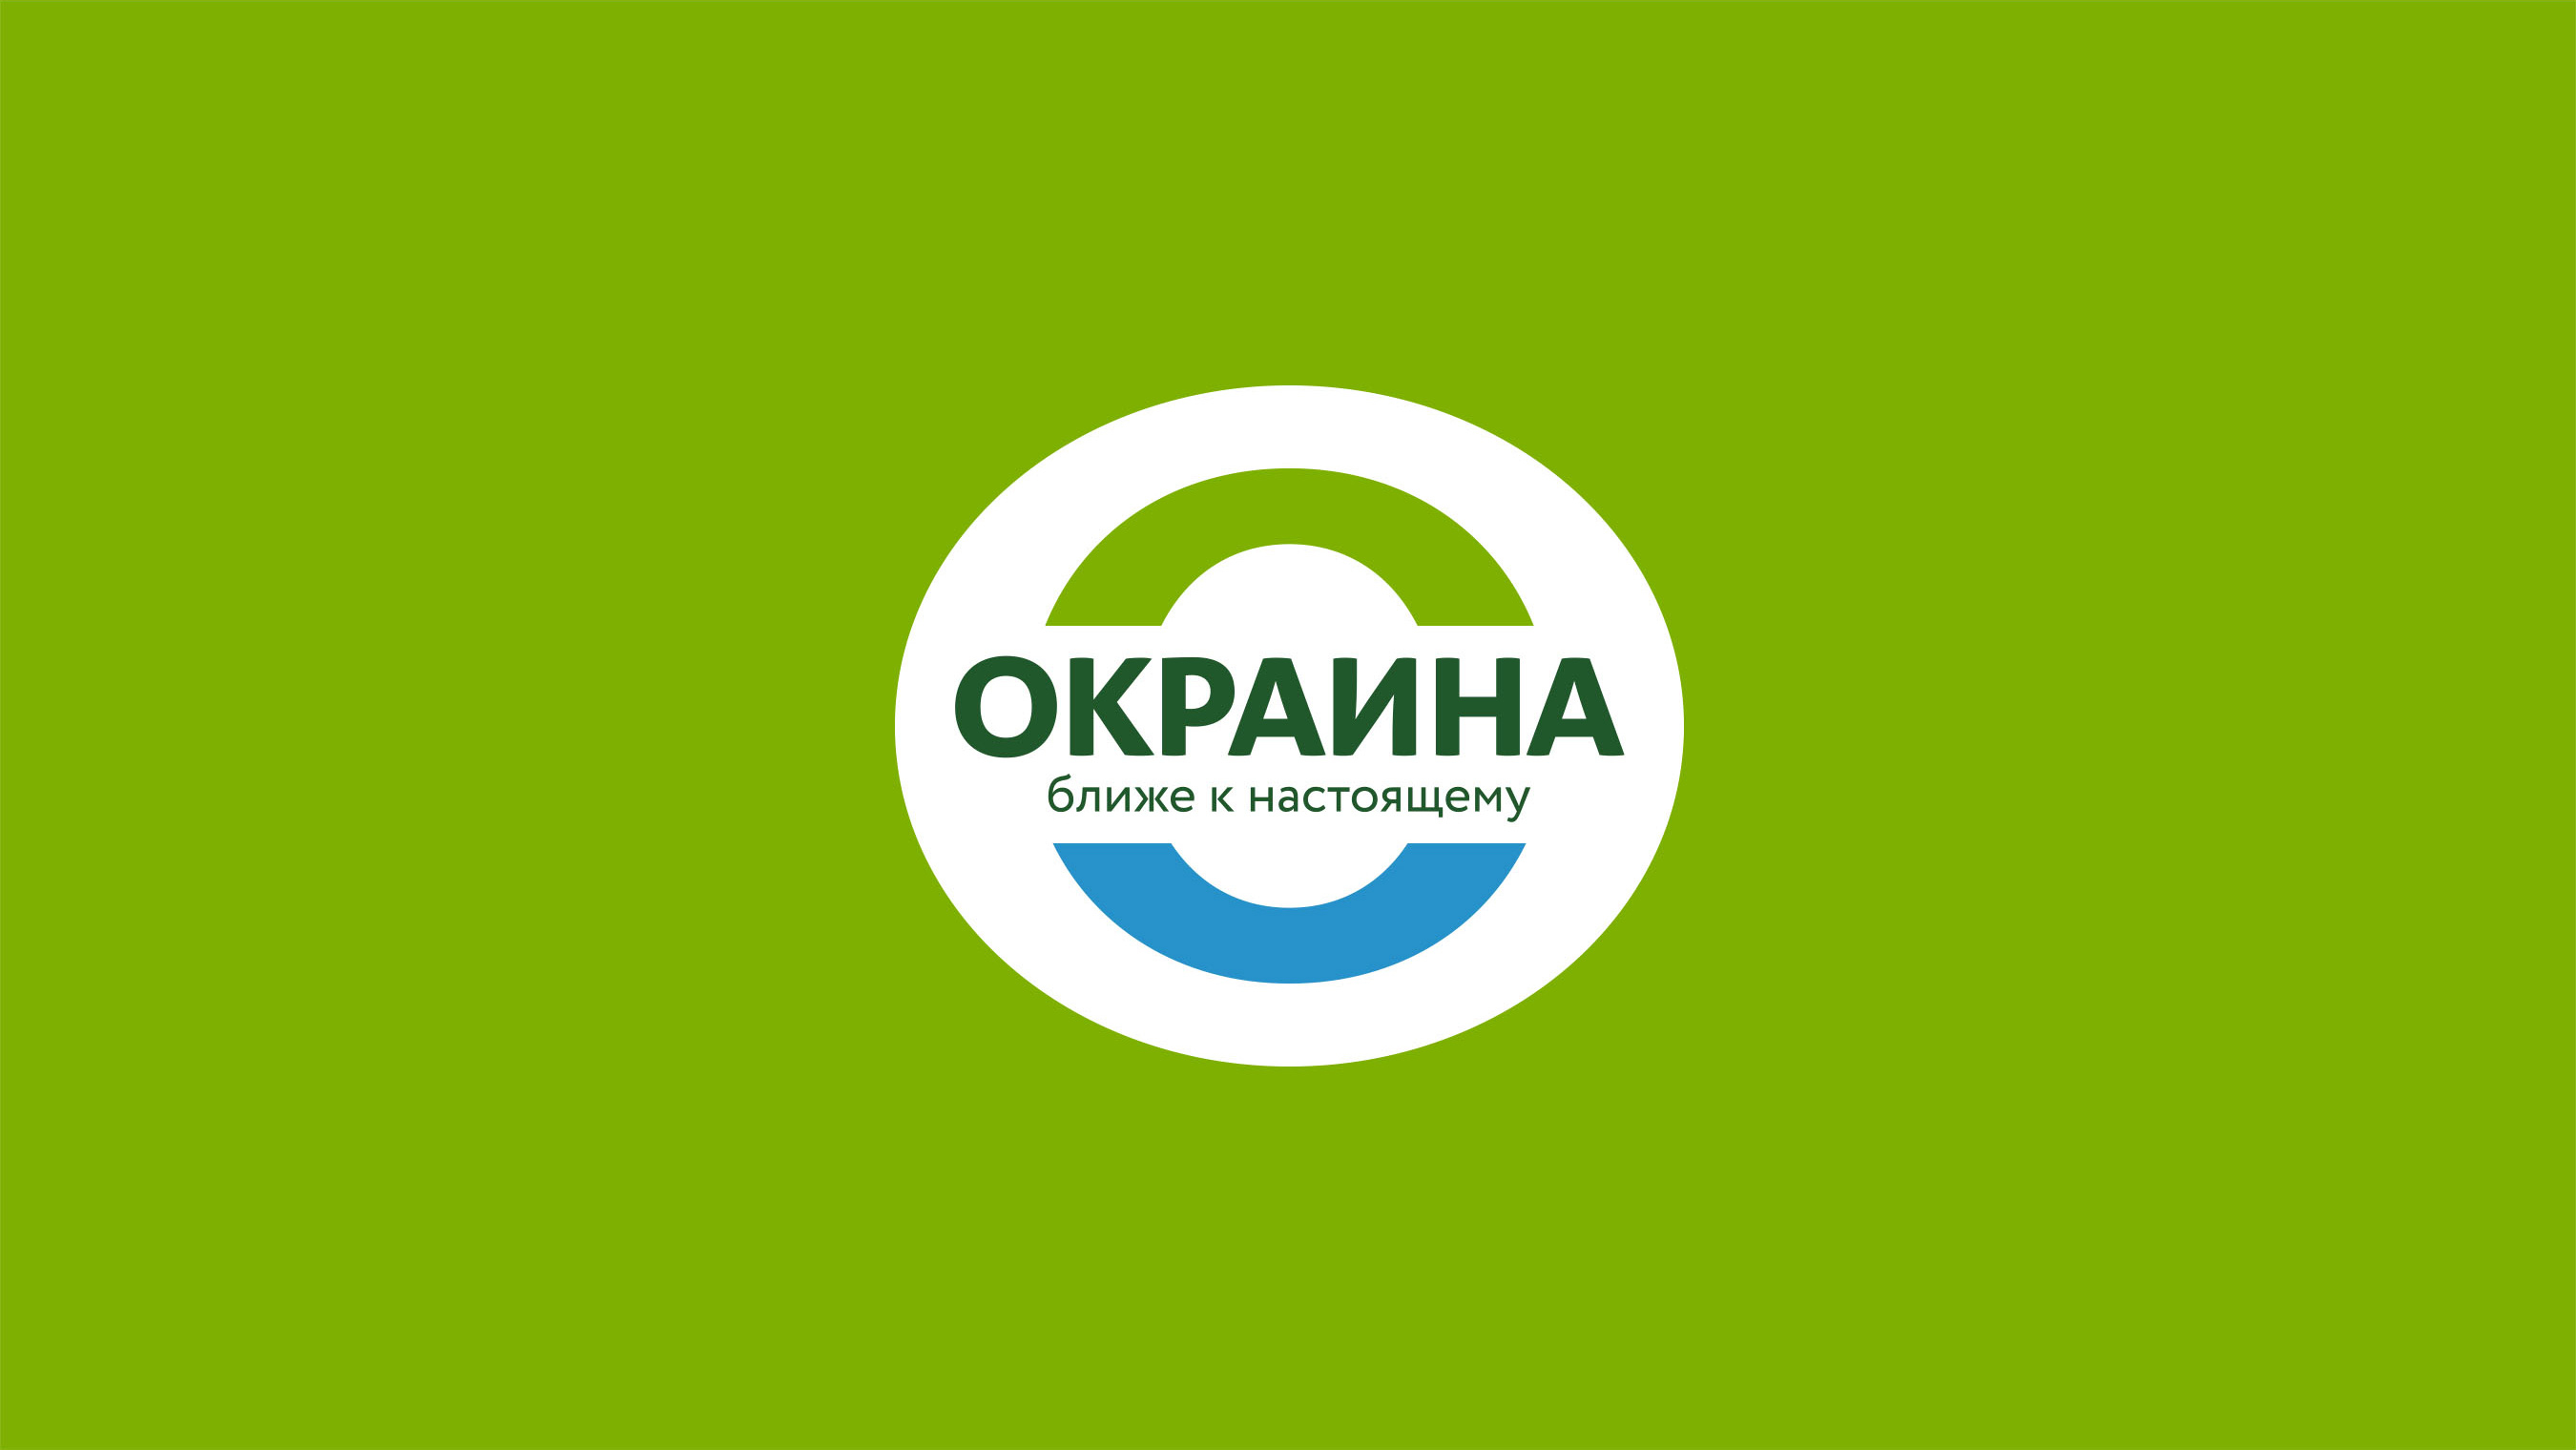 Разработка логотипа корпоративного бренда мясоперерабатывающего холдинга «Окраина»